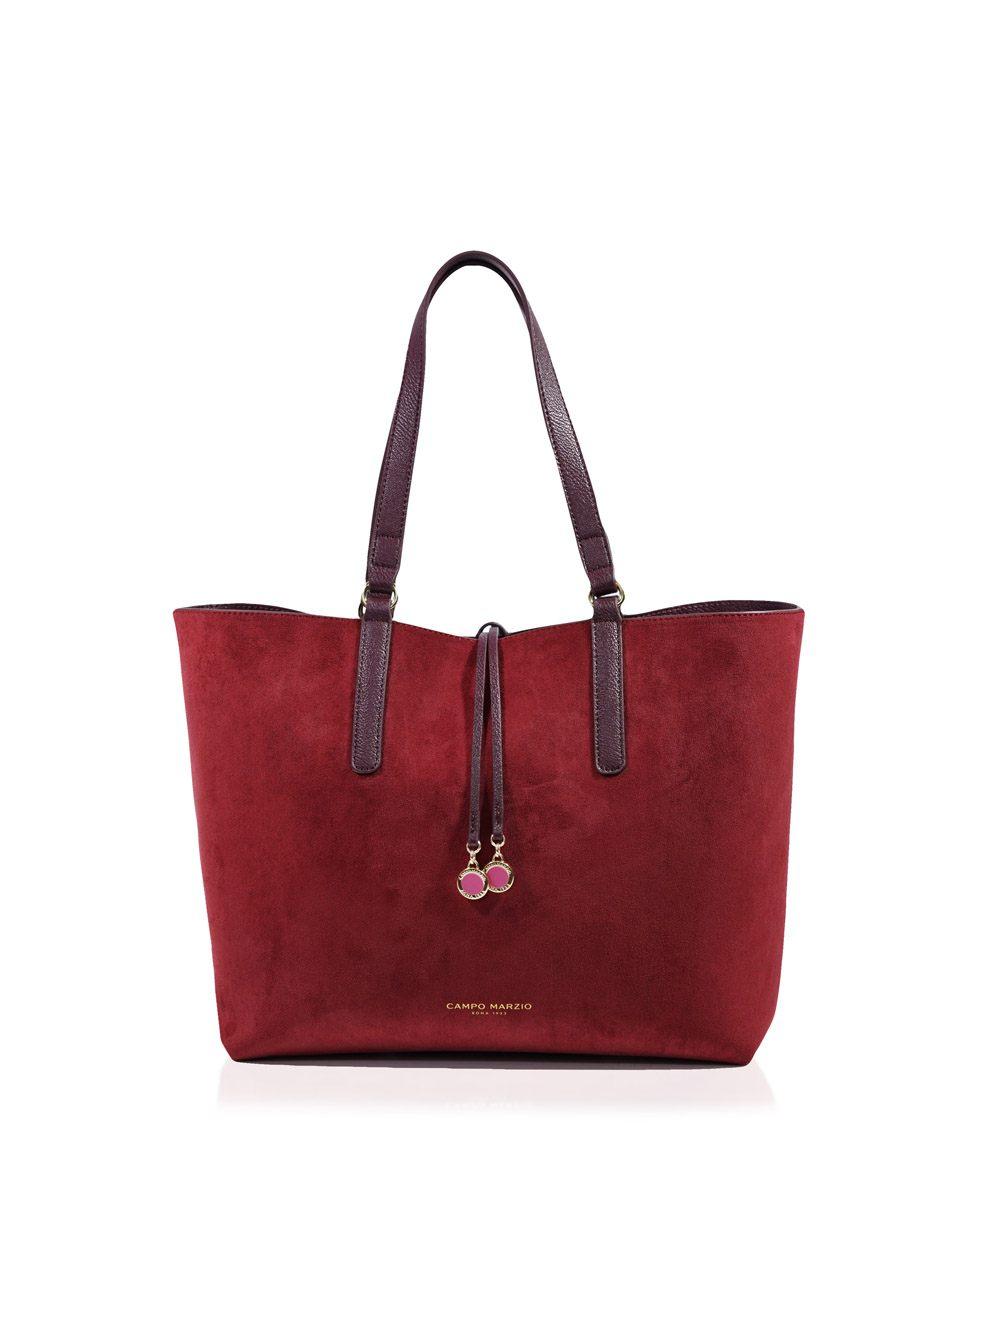 Shopping Bag Danielle - Red Wine